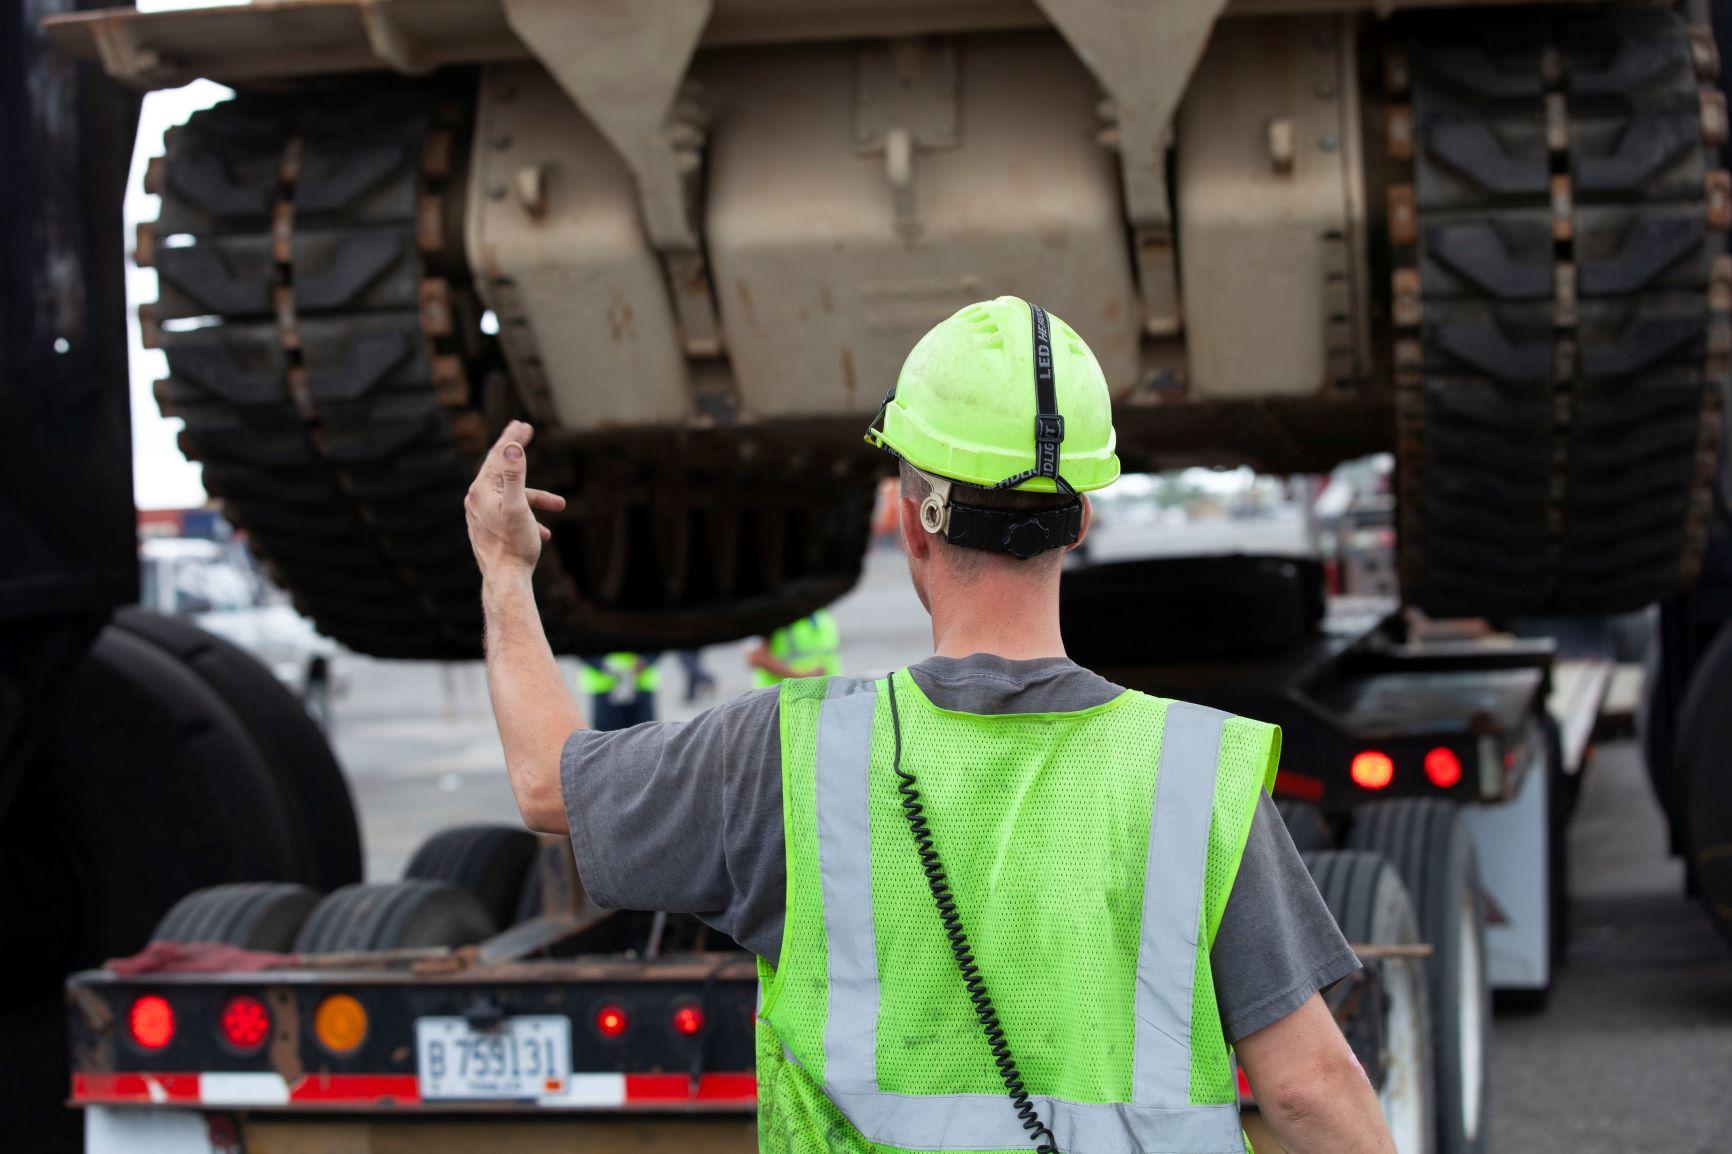 Directing cargo